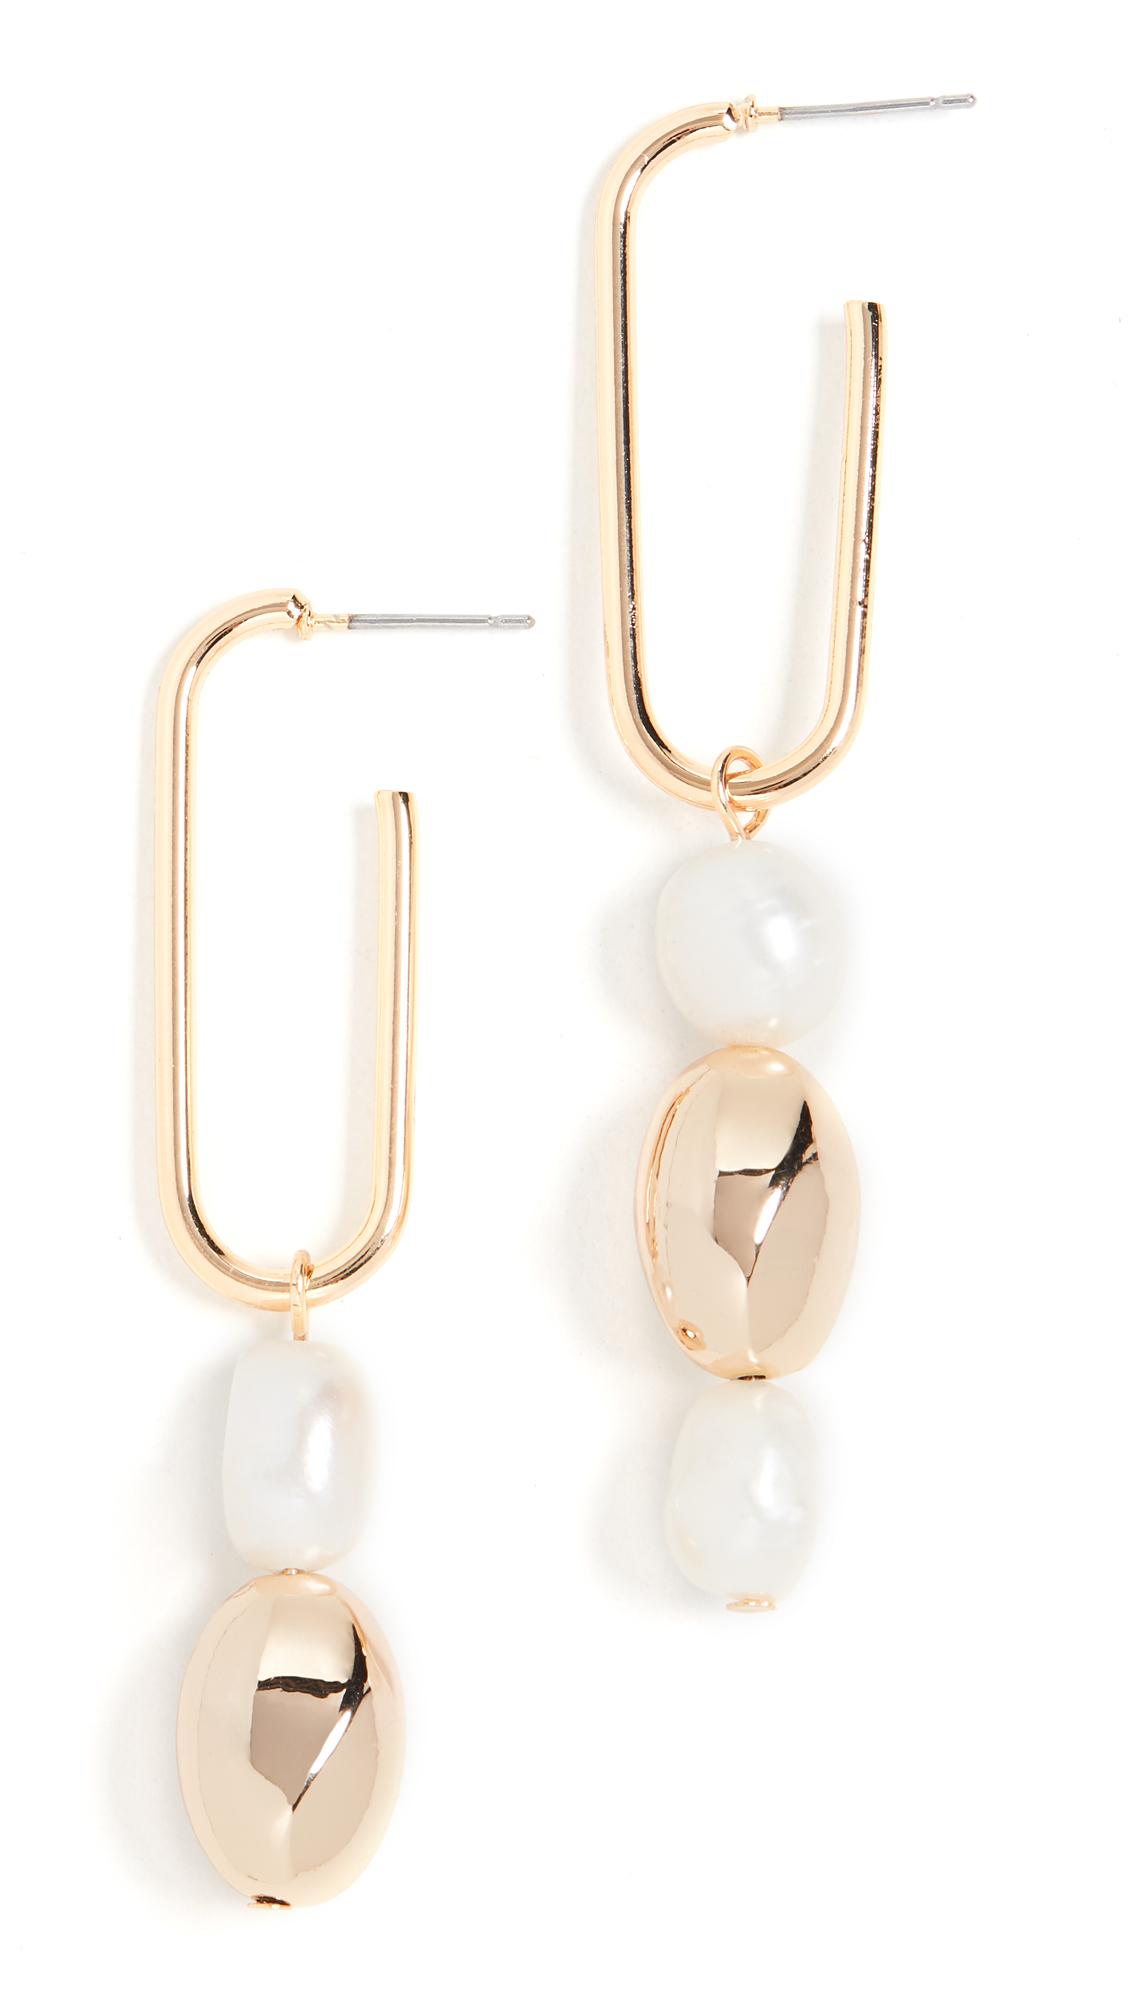 Jules Smith Pearl Drop Earrings In Gold/Pearl